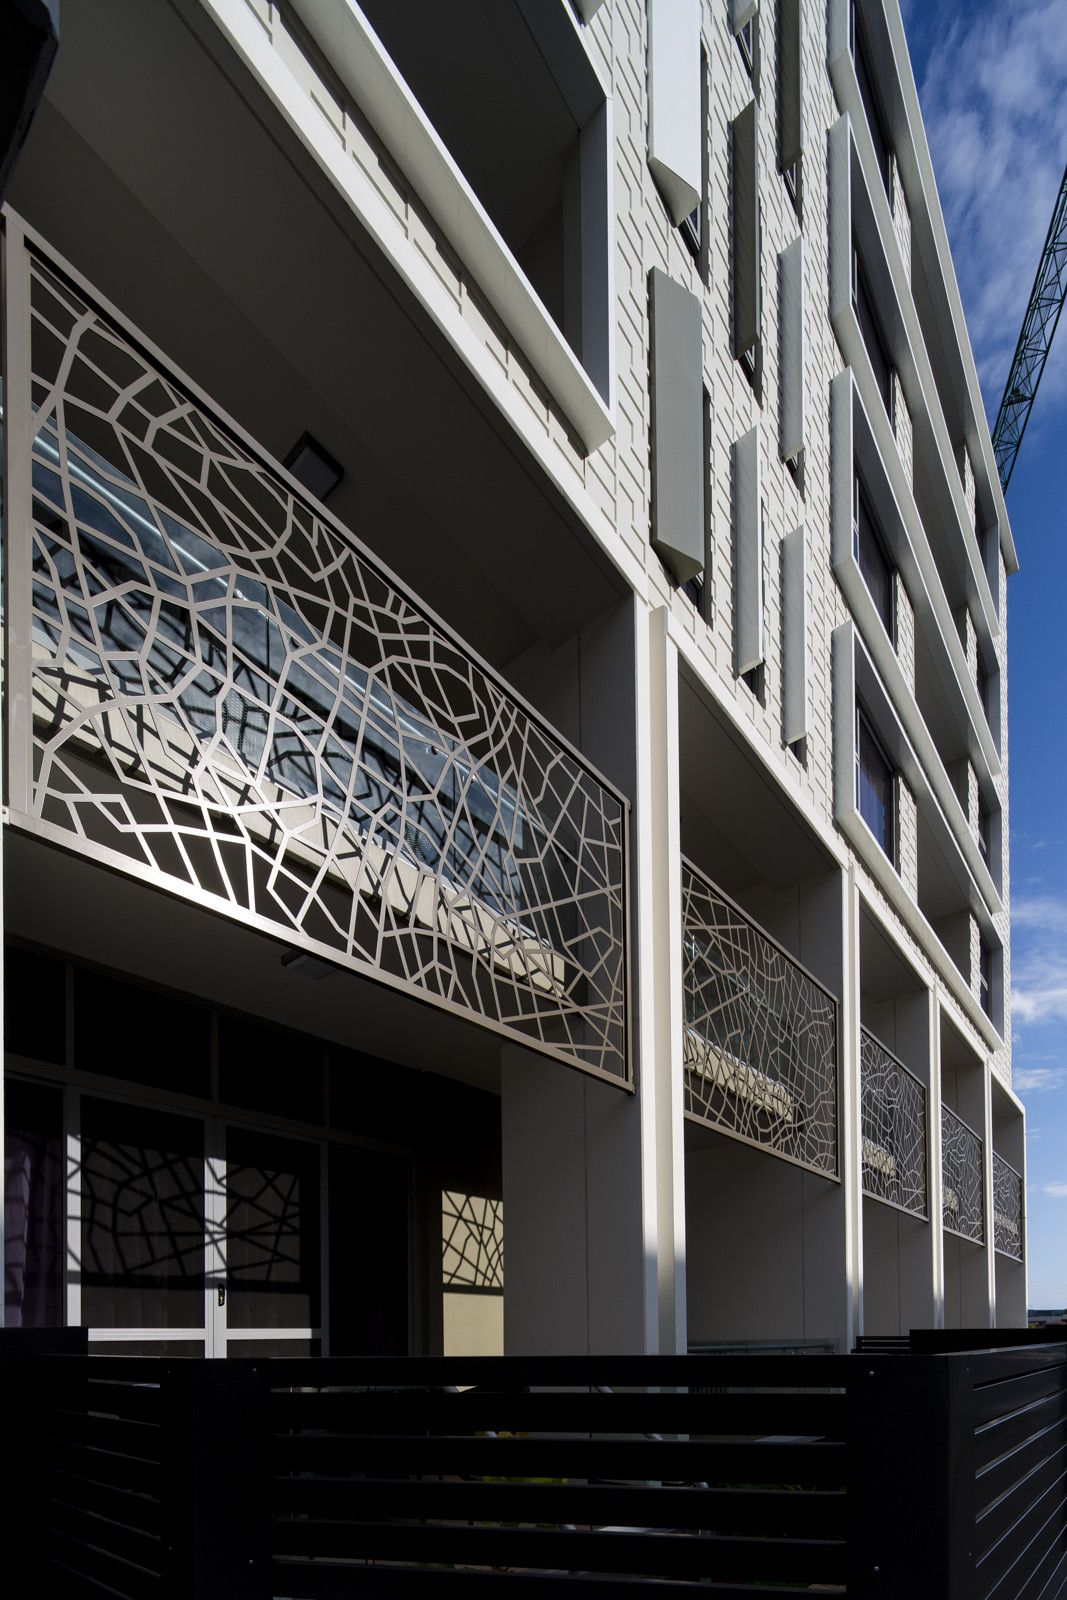 Gallery Of Vsq2 Tony Caro Architecture 19 Architecture Architecture Photography Architecture Design